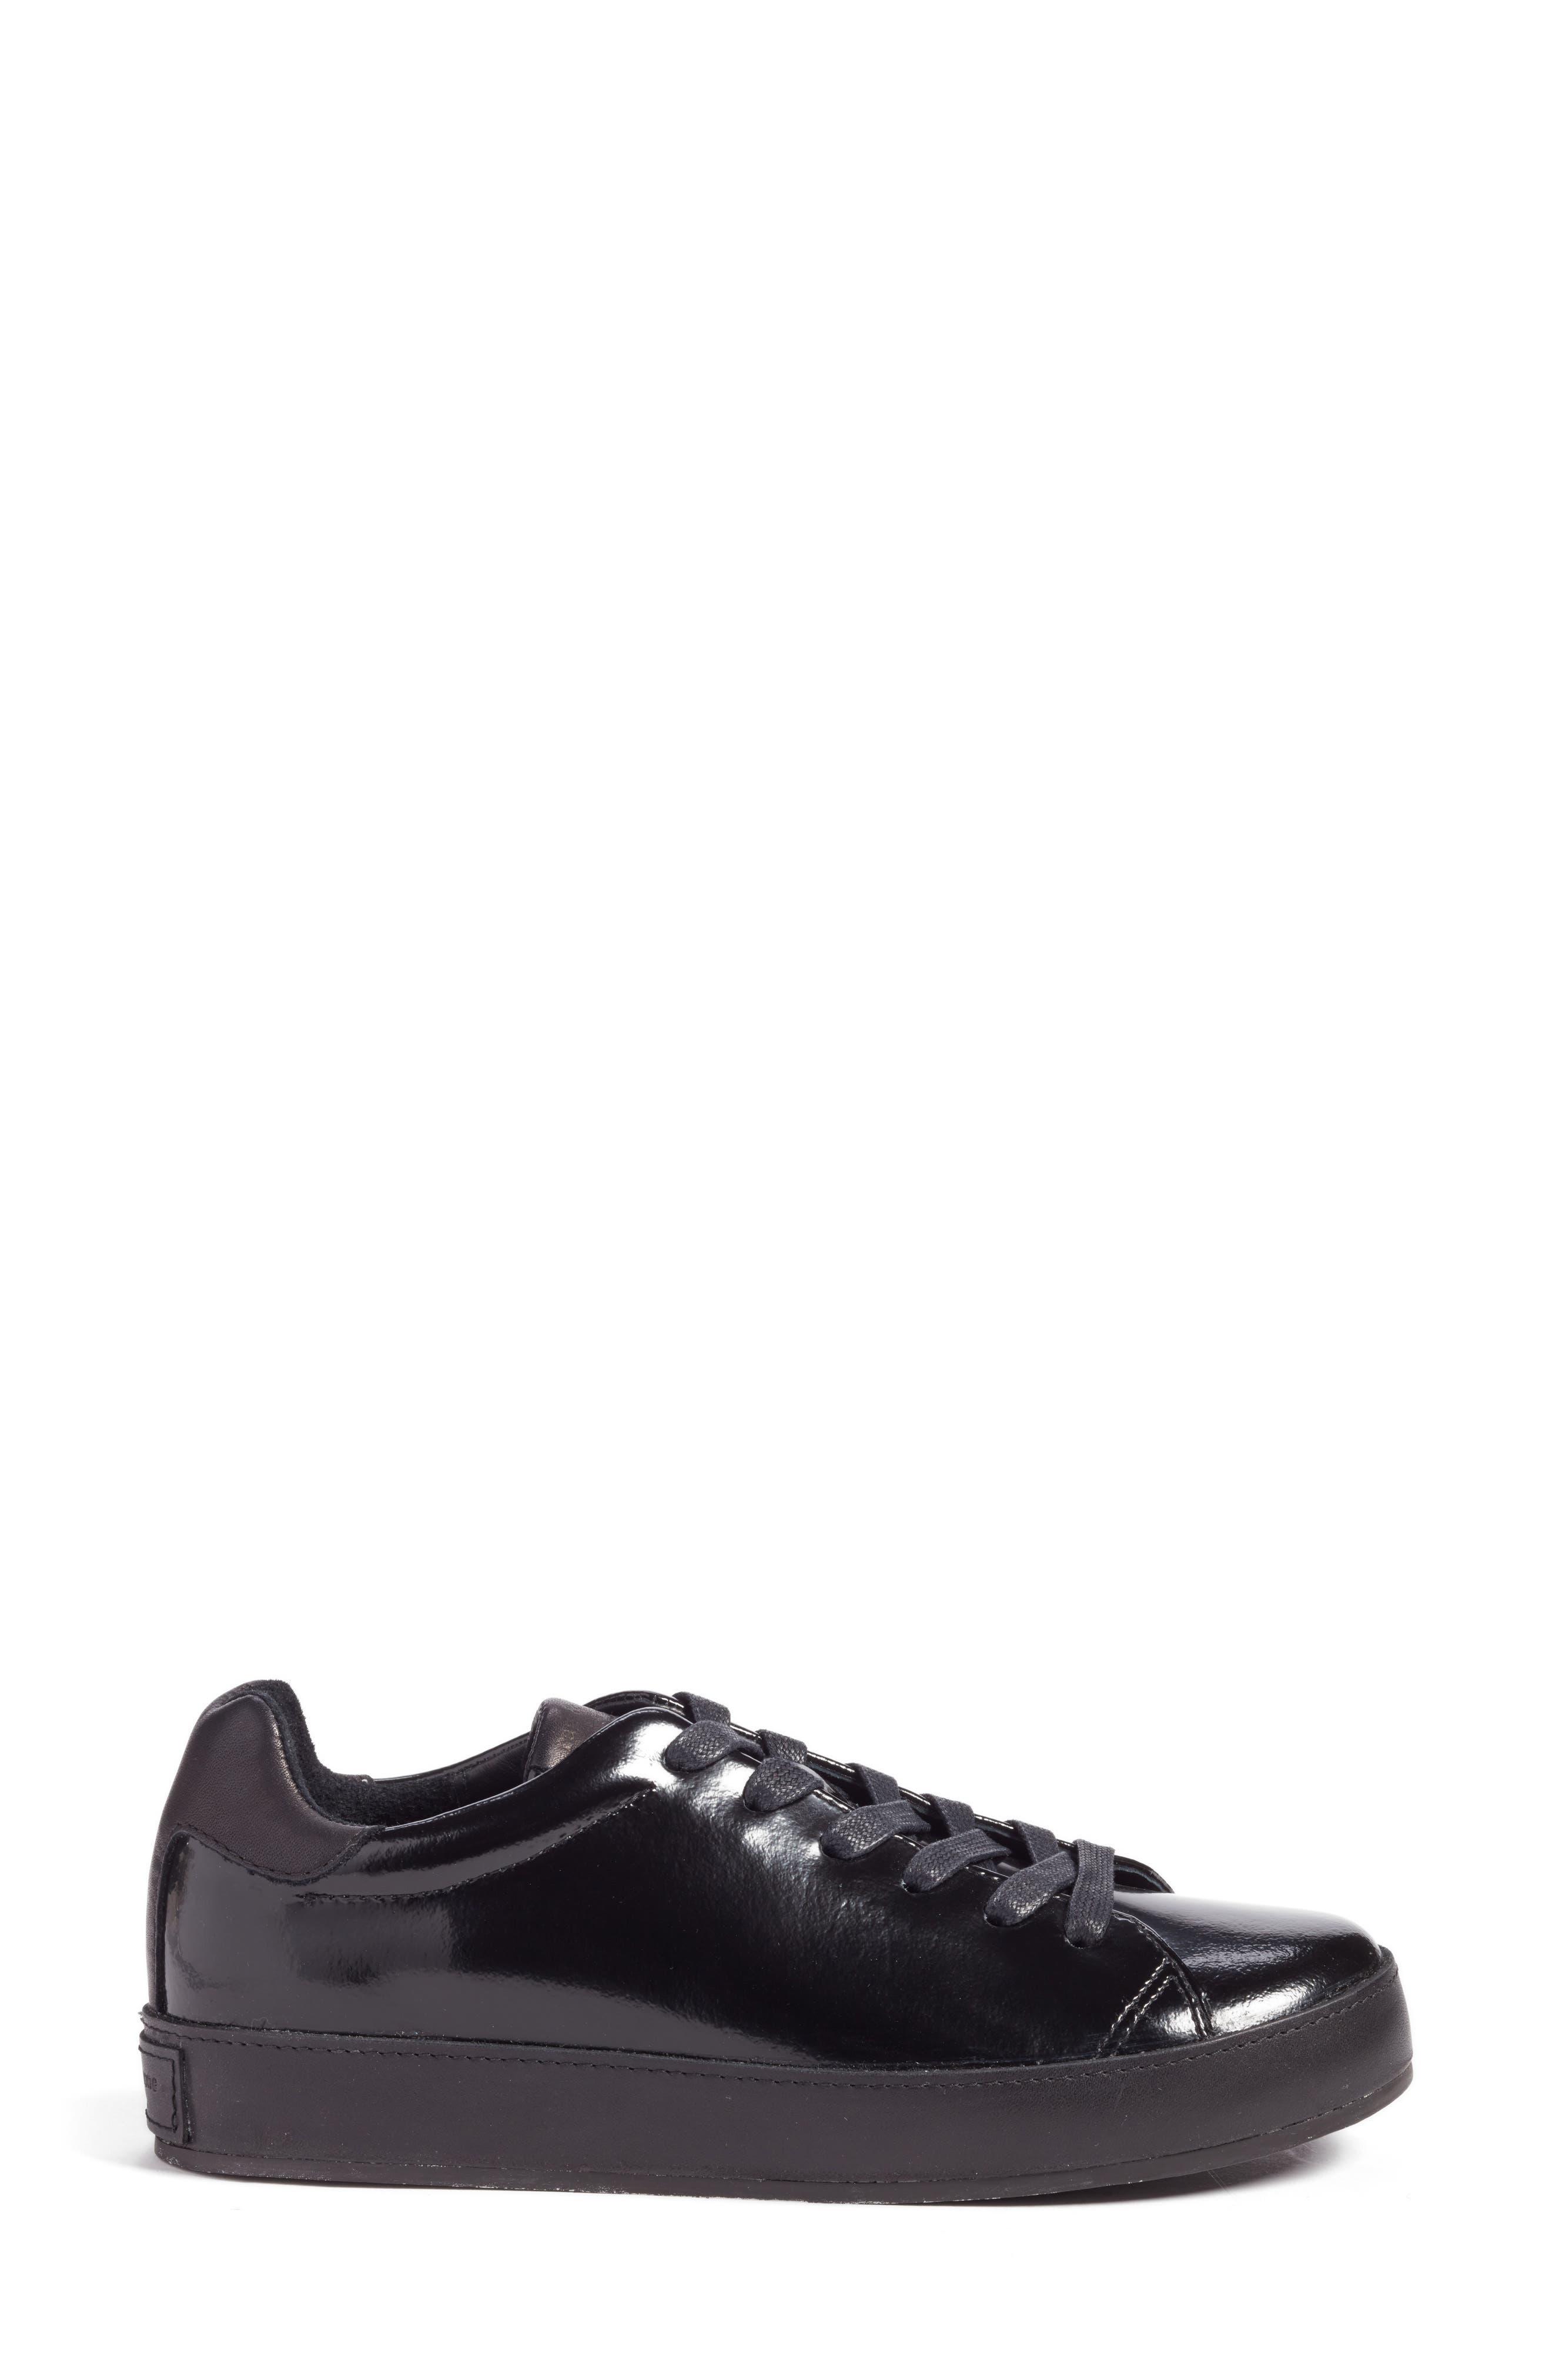 RB1 Low-Top Sneaker,                             Alternate thumbnail 3, color,                             001